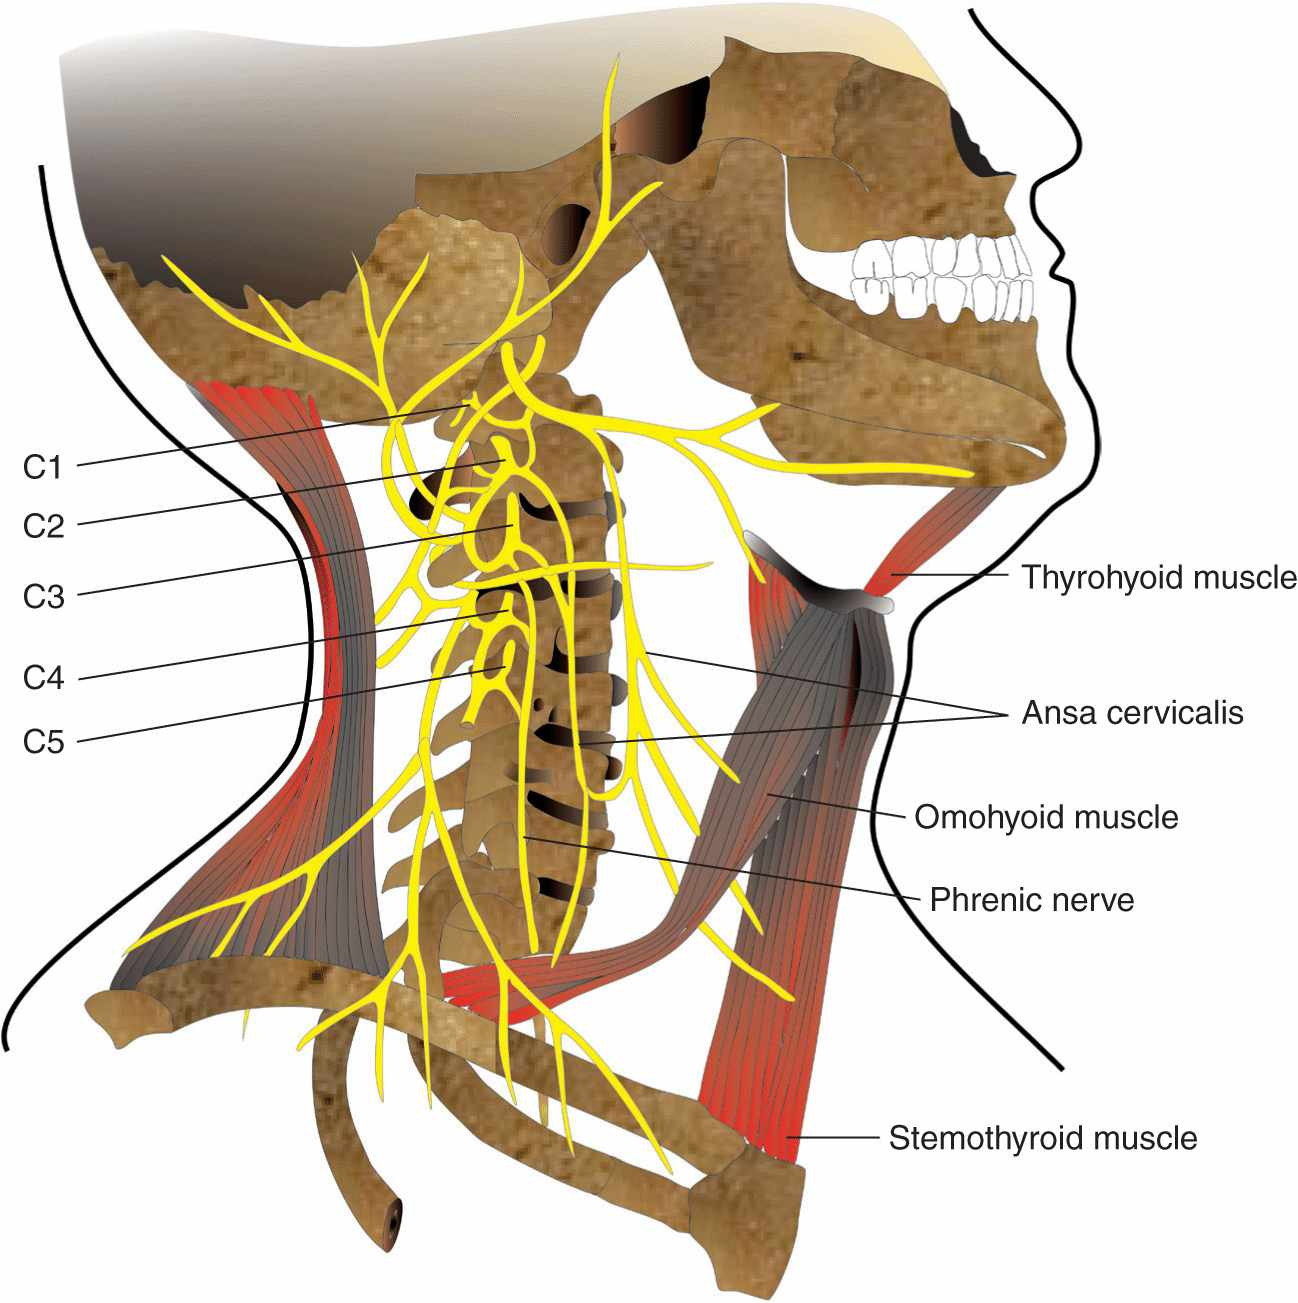 burke chiropractor chiropractic cspine.jpeg